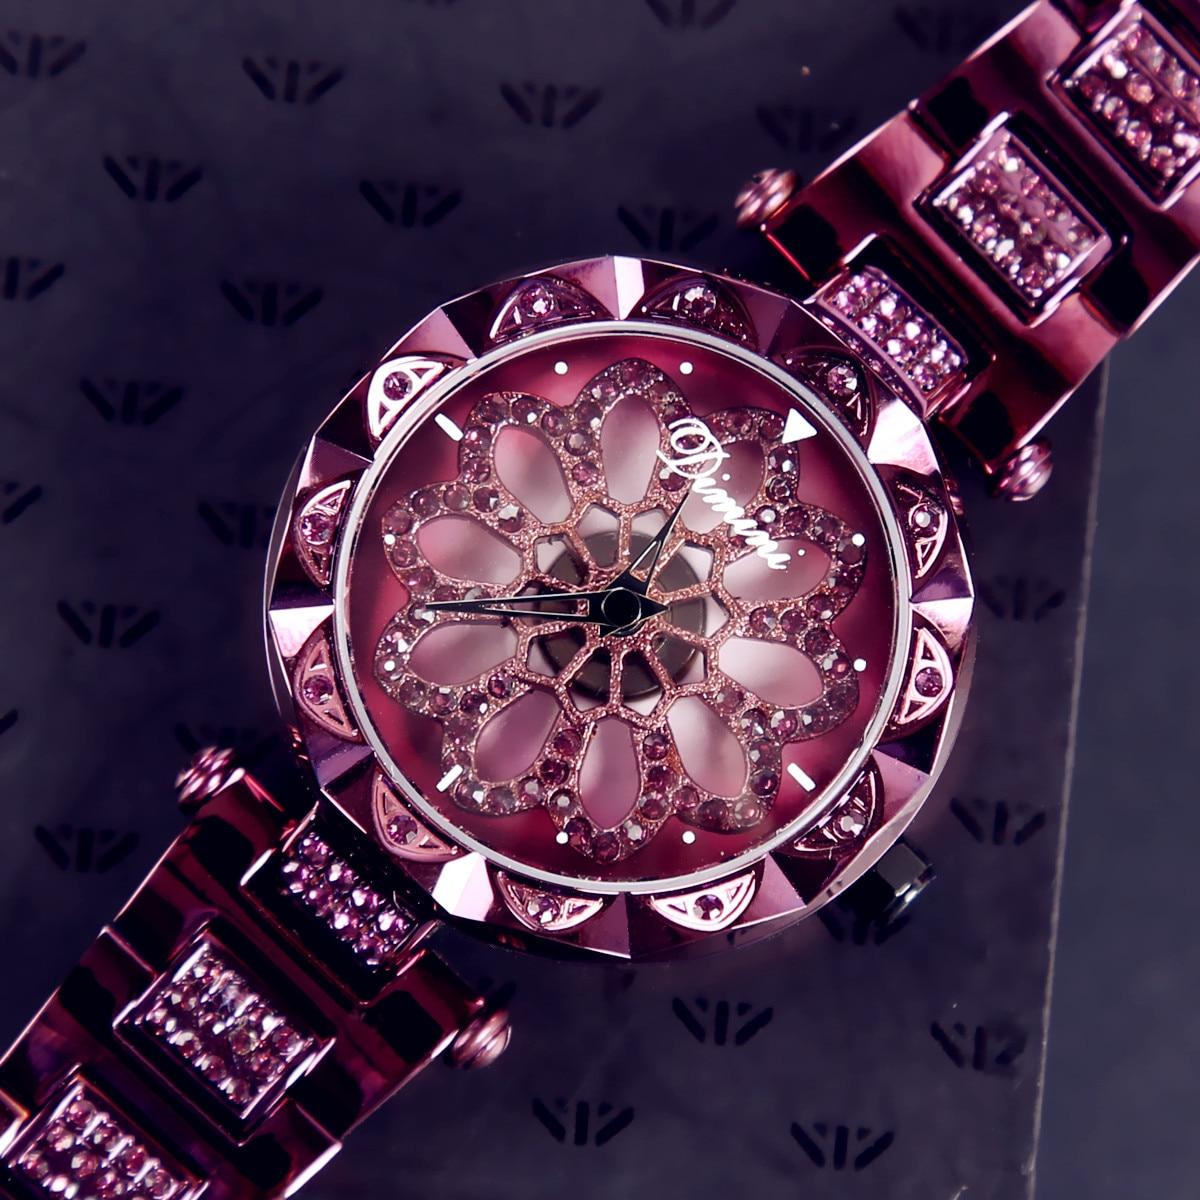 luxury-reloj-mujer-hombre-women-flower-font-b-rosefield-b-font-watch-quartz-wristwatches-elegant-relogio-feminino-party-dress-clock-dropship